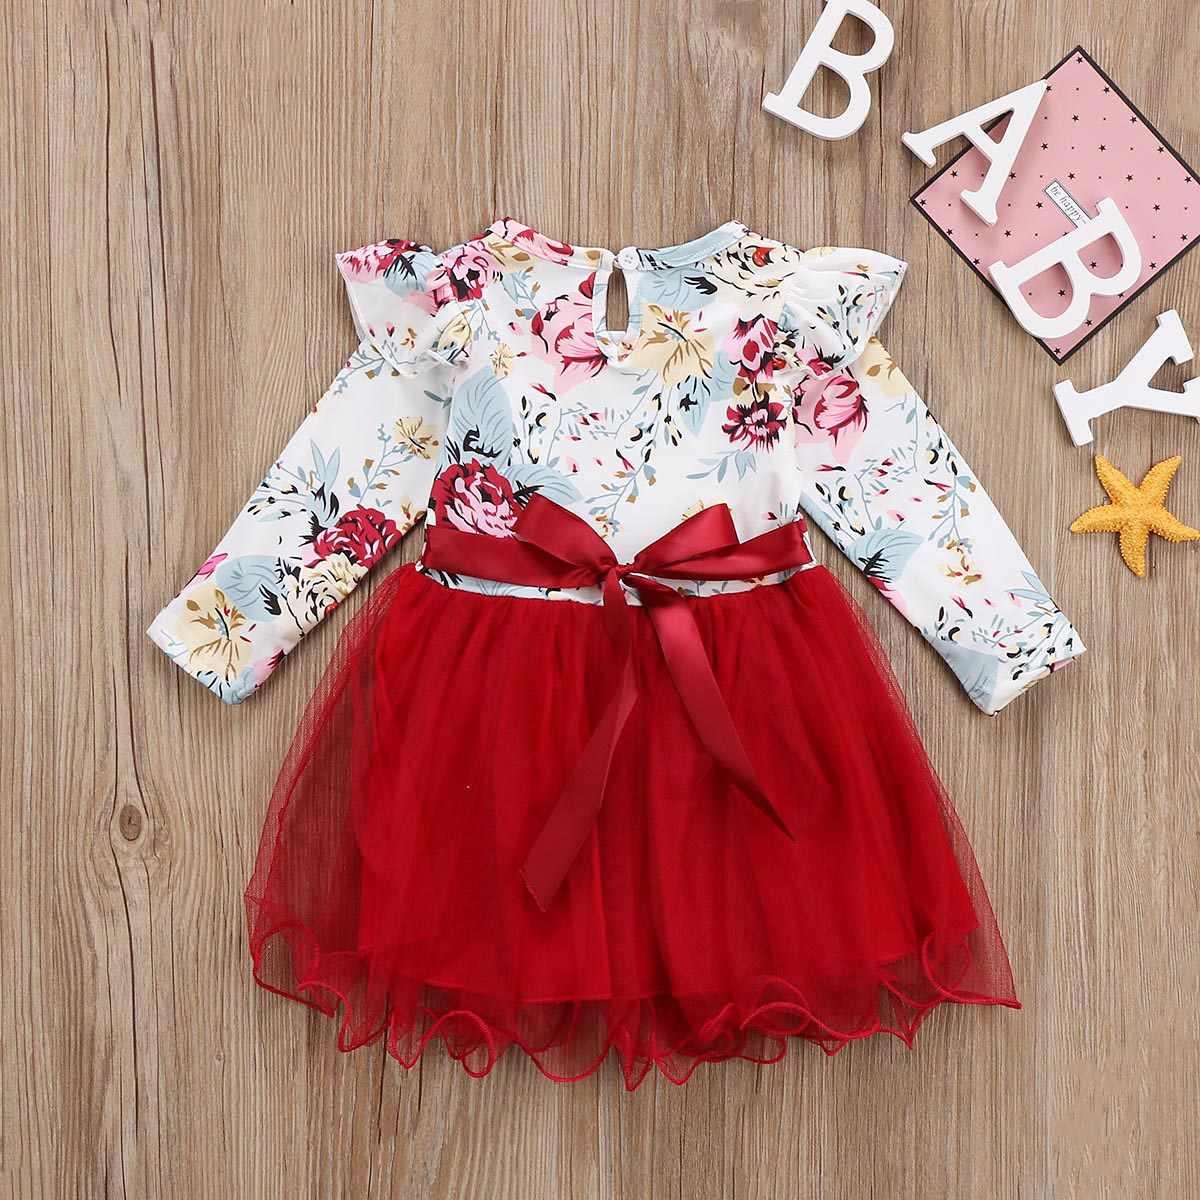 060de8438c ... Newborn Kids Baby Girls Dress Autumn Long Sleeve Round Neck Floral  Tulle Tutu Dress Girl Clothing ...